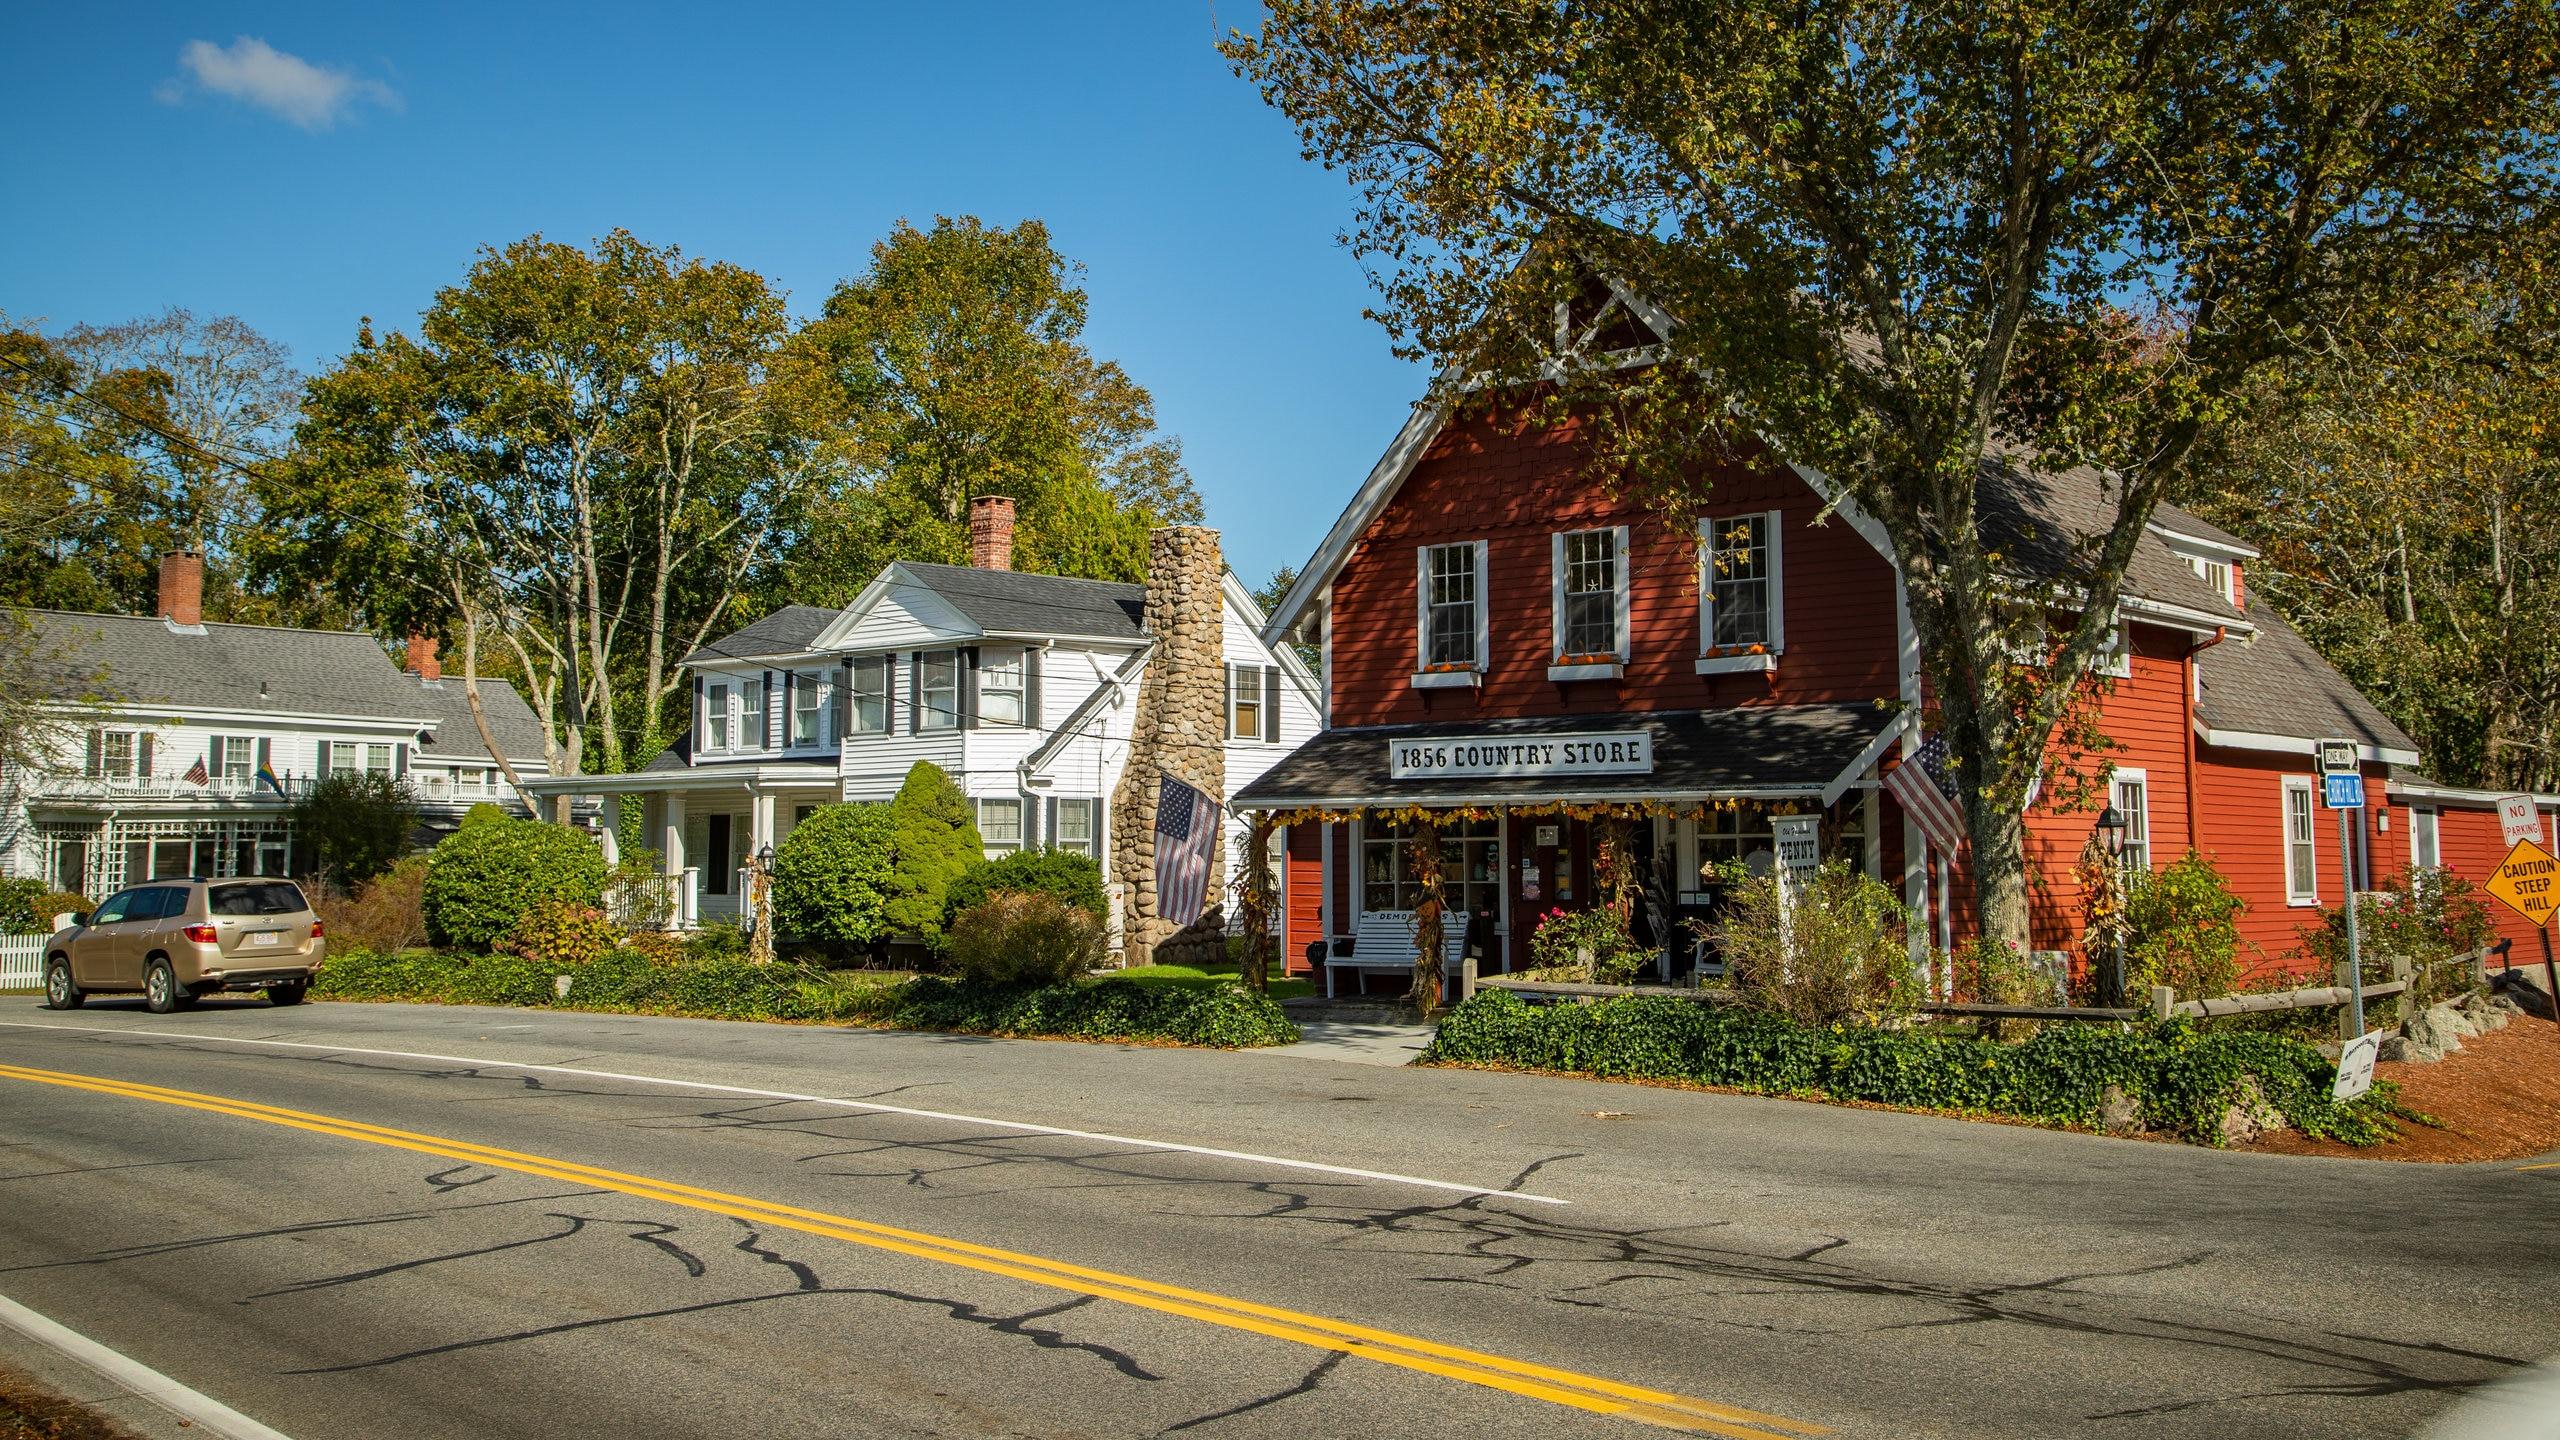 Centerville, Massachusetts, United States of America